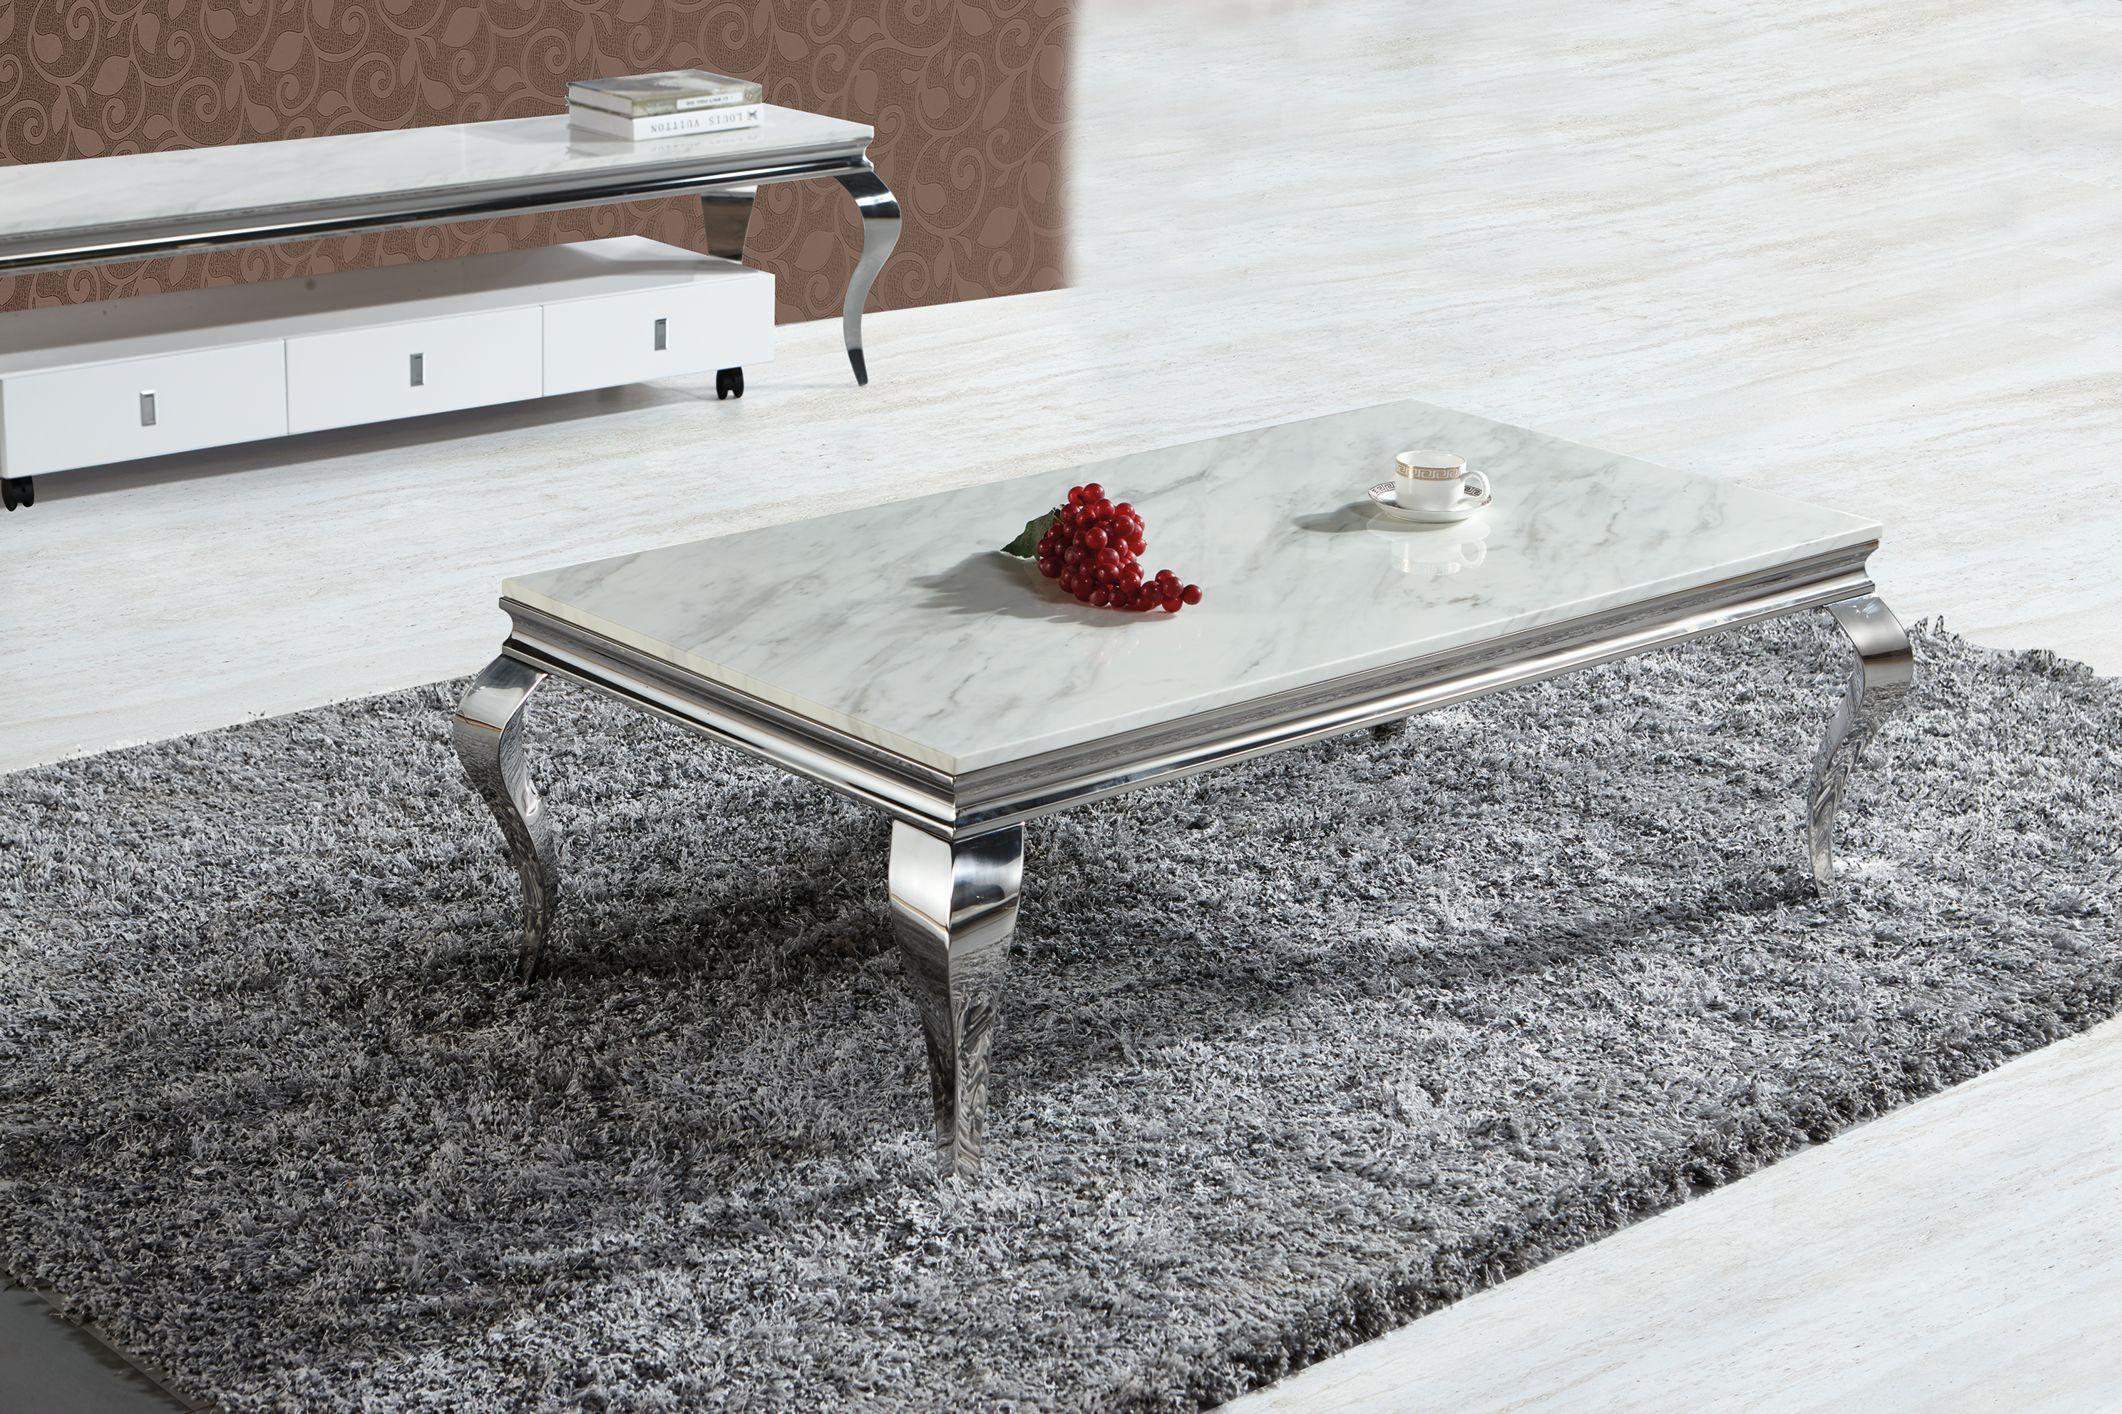 polo 1203 chrom silber gold couchtisch verschiedene gr en. Black Bedroom Furniture Sets. Home Design Ideas